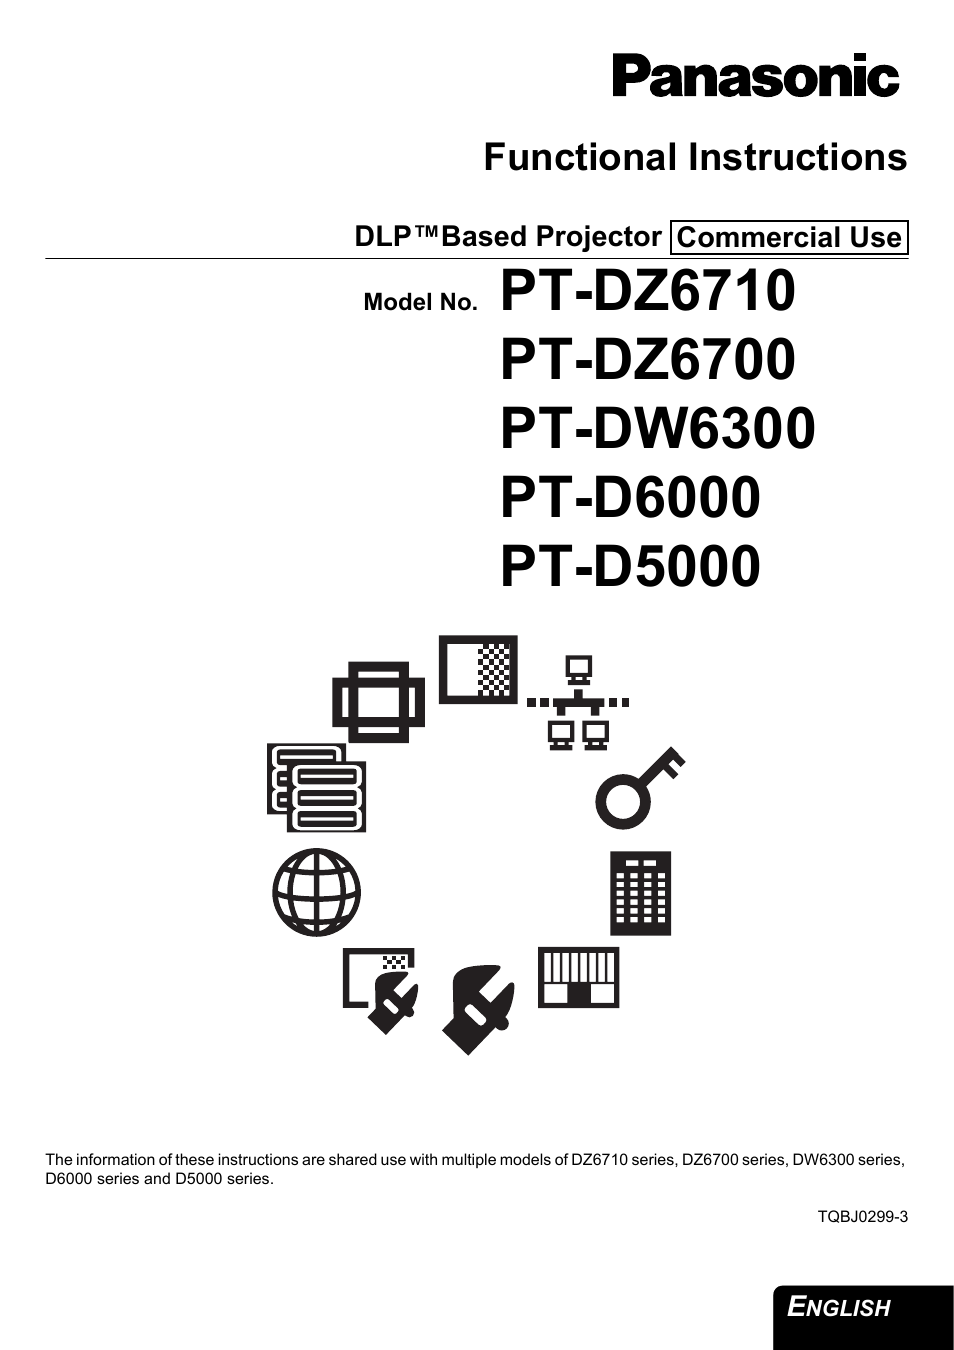 panasonic pt dz6710 user manual 52 pages also for pt d6000 pt rh manualsdir com panasonic pt-d6000 projector manual Panasonic Vt